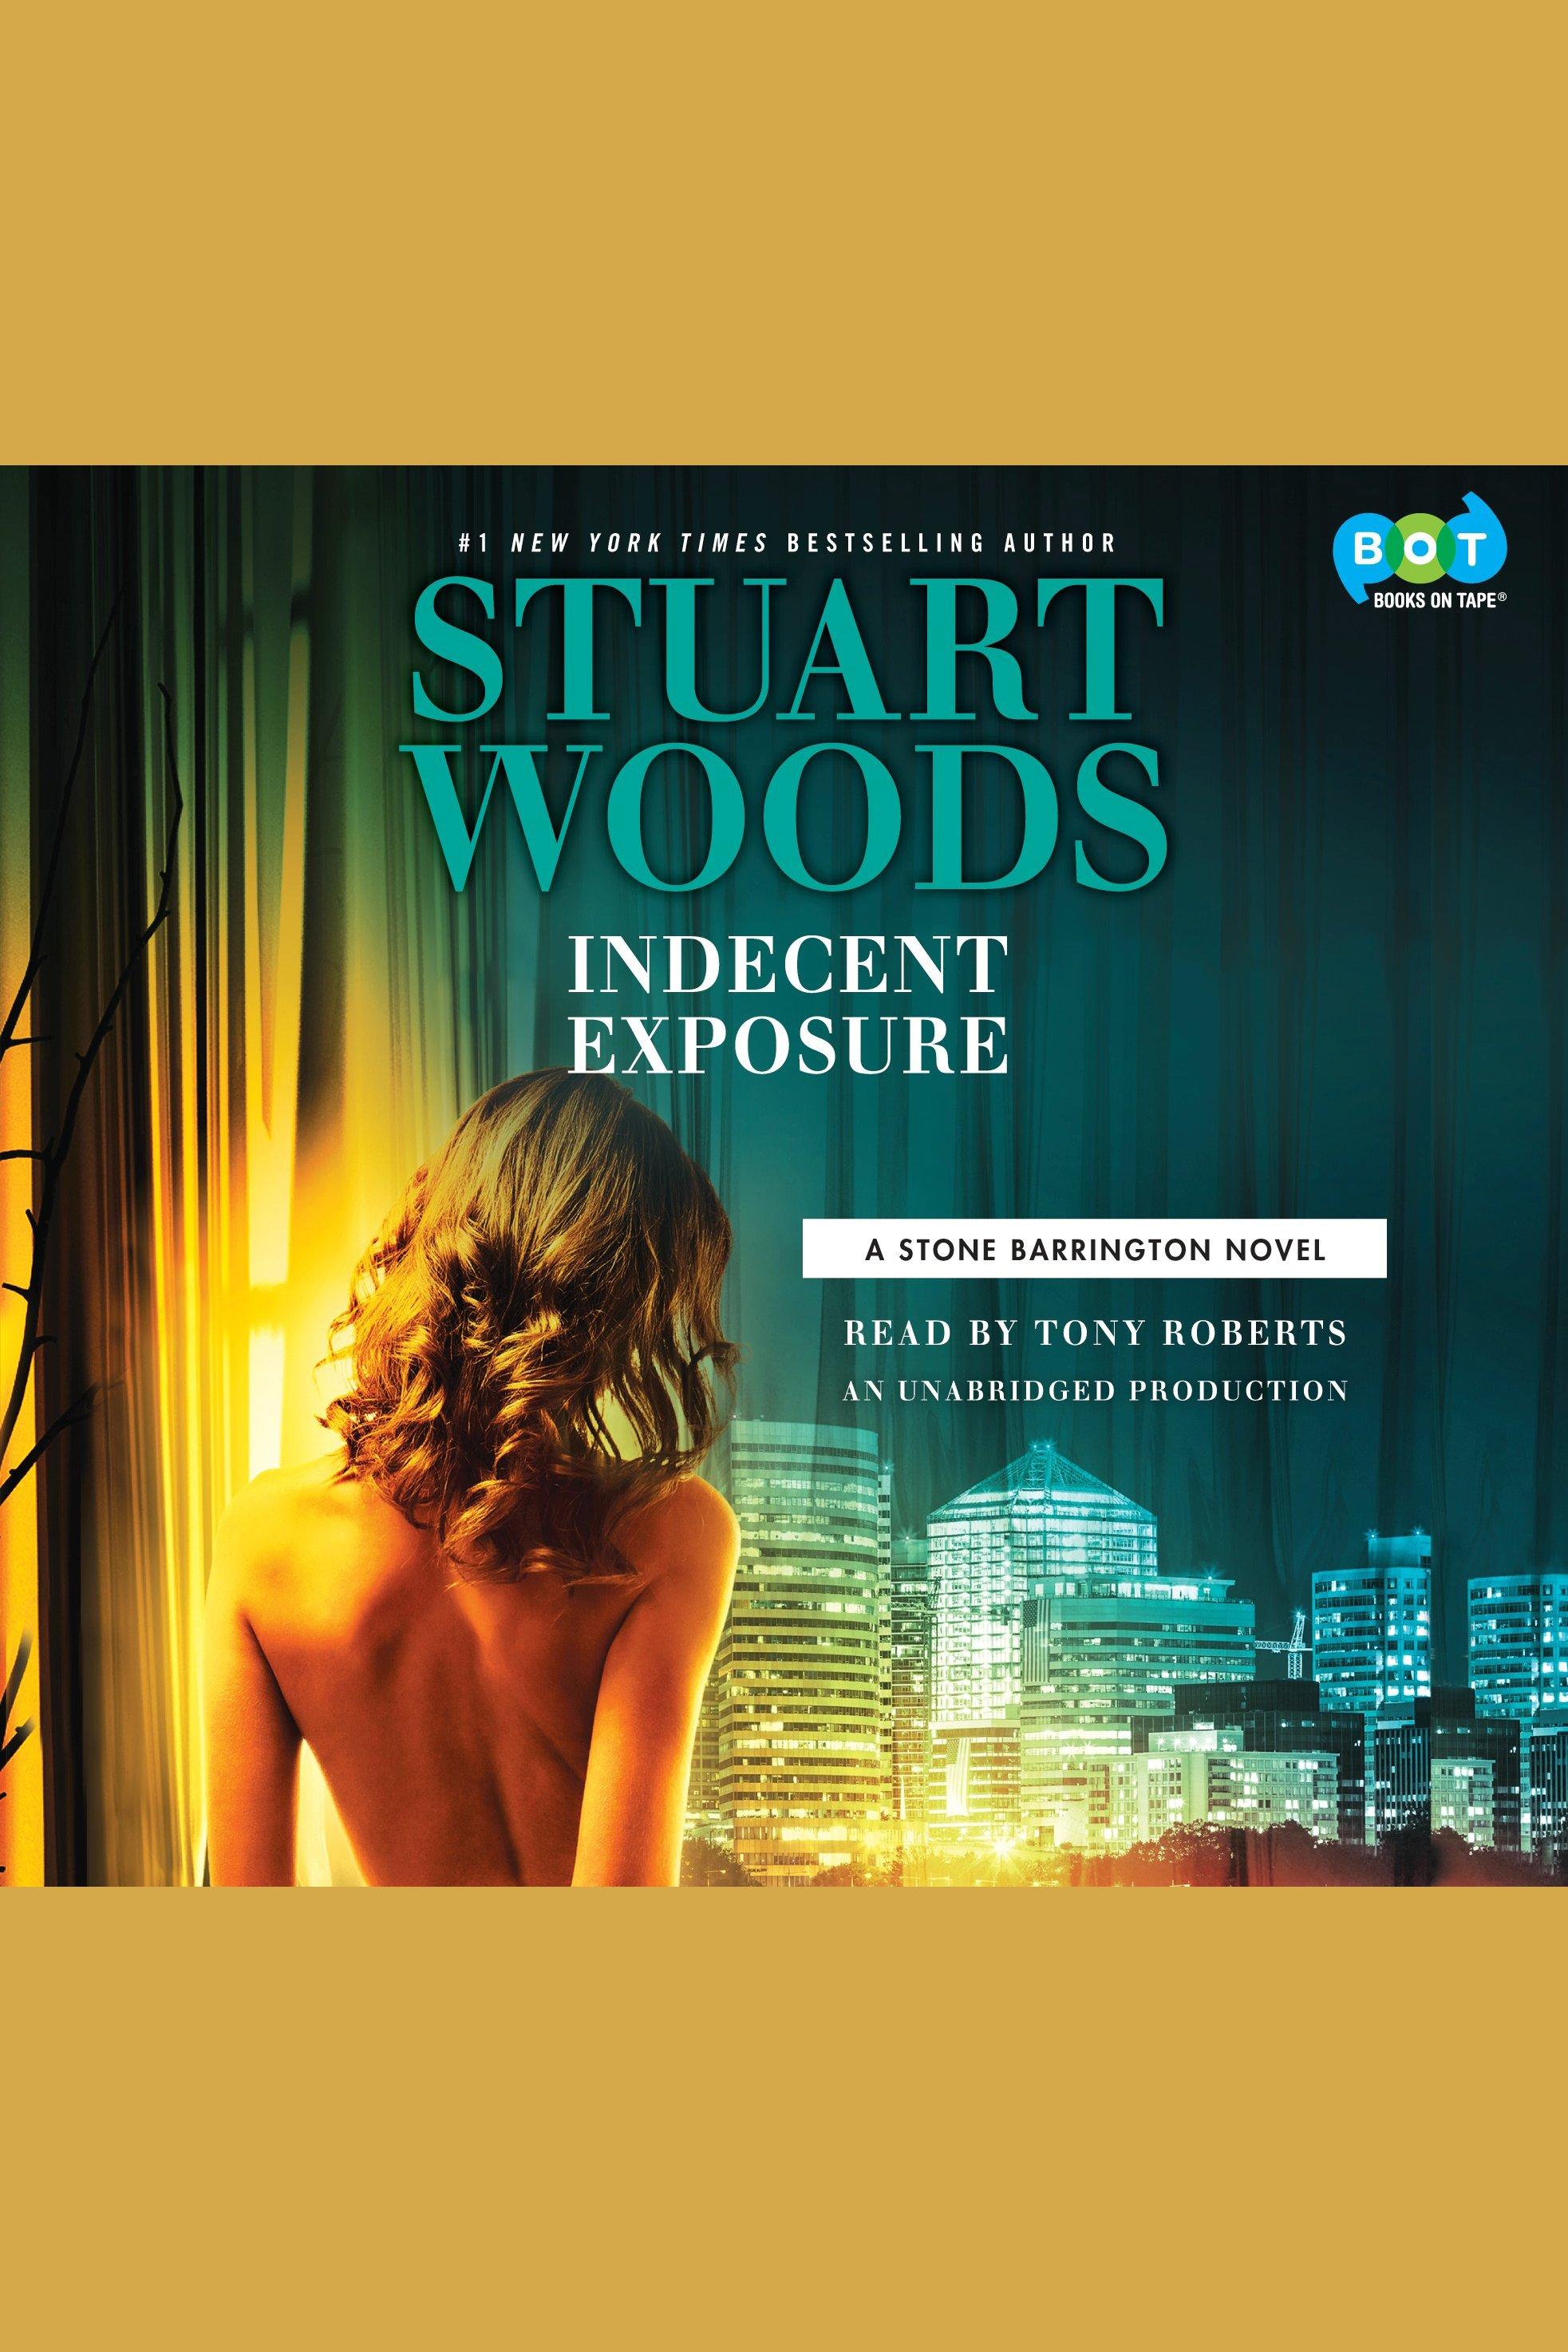 Indecent exposure [AudioEbook]